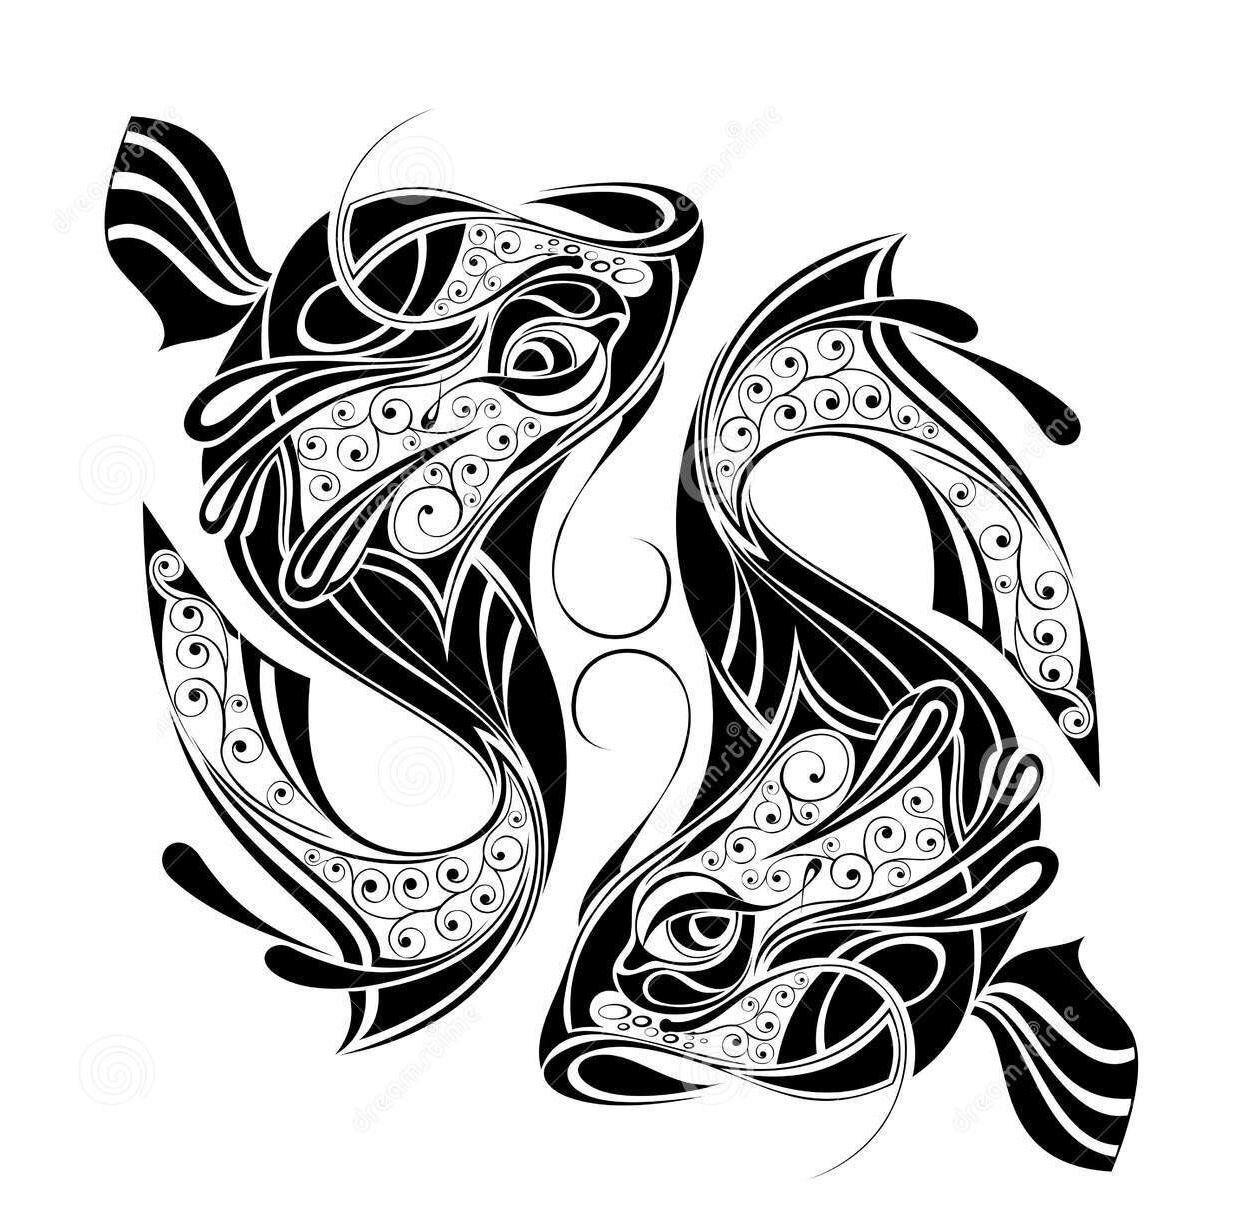 Pisces tiger